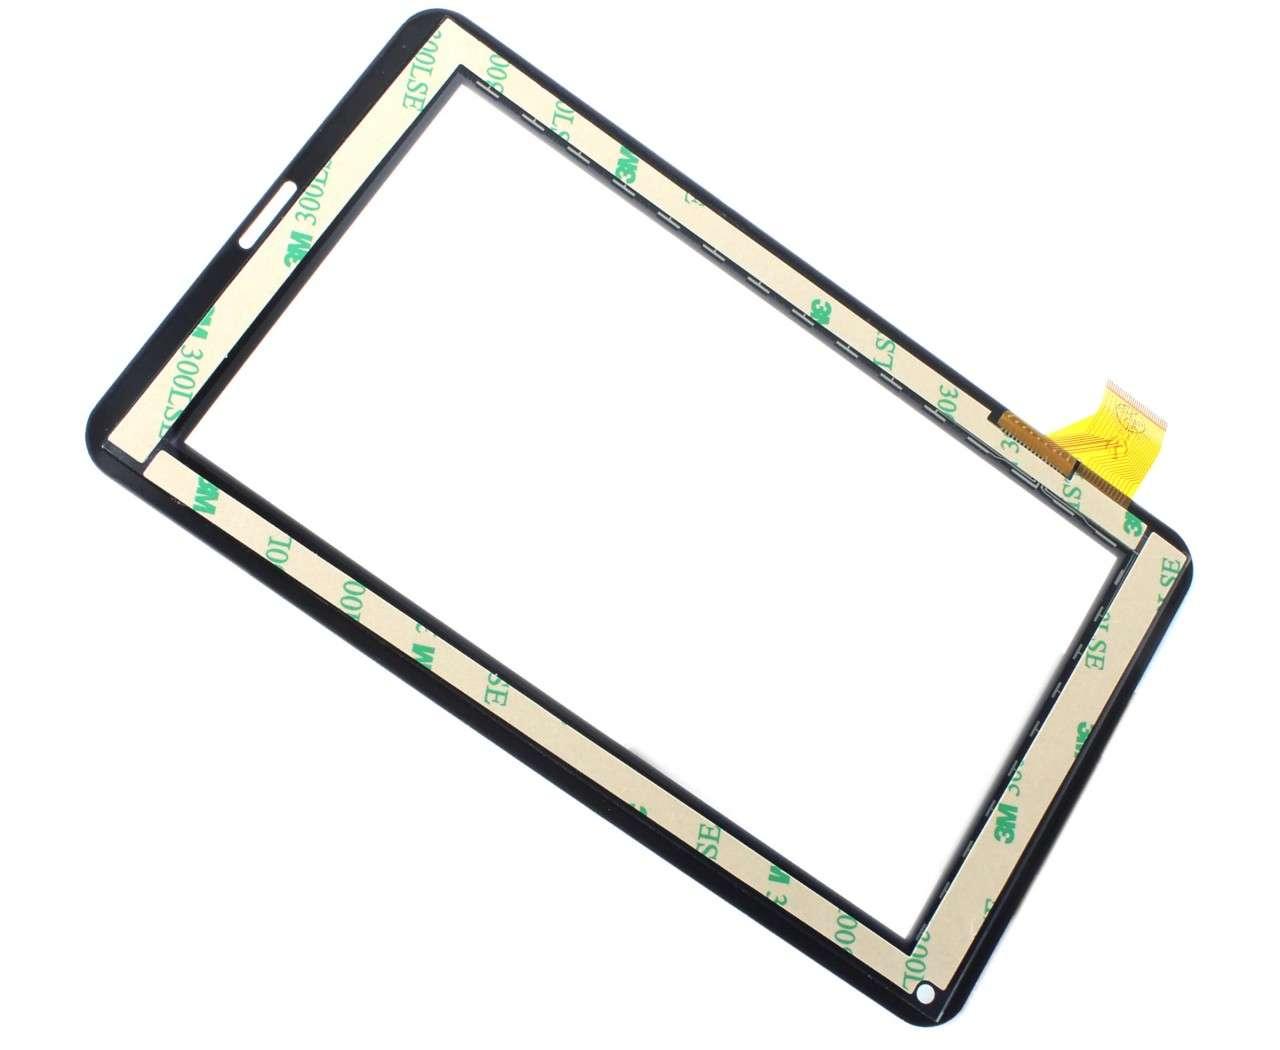 Touchscreen Digitizer MPMAN MPDC706 Geam Sticla Tableta imagine powerlaptop.ro 2021